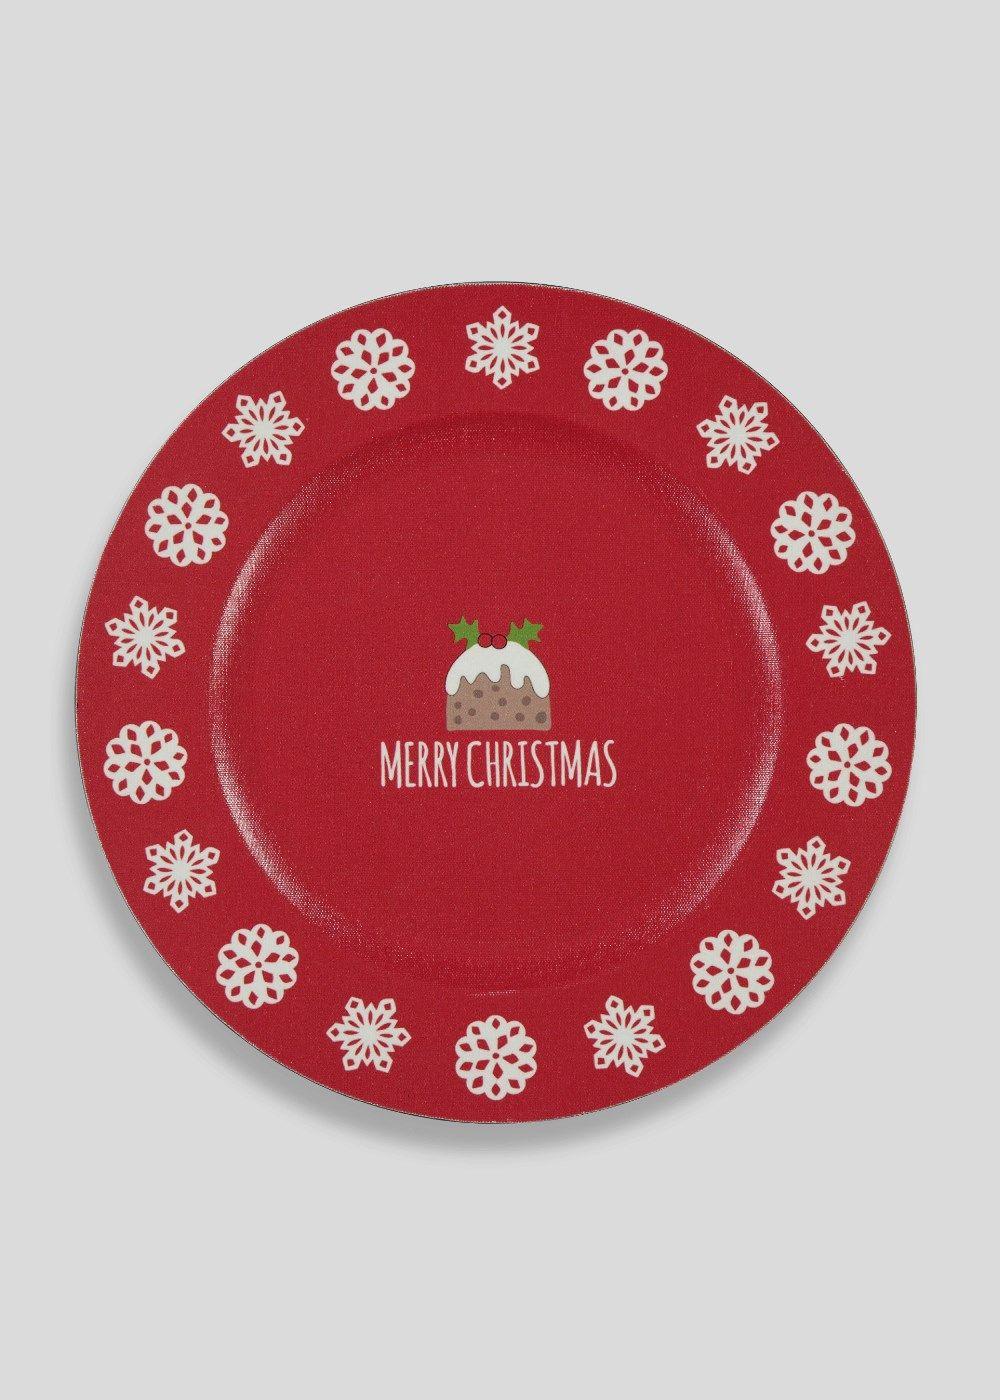 Christmas Shop Christmas Plates Charger Plates Decor Shop Decoration